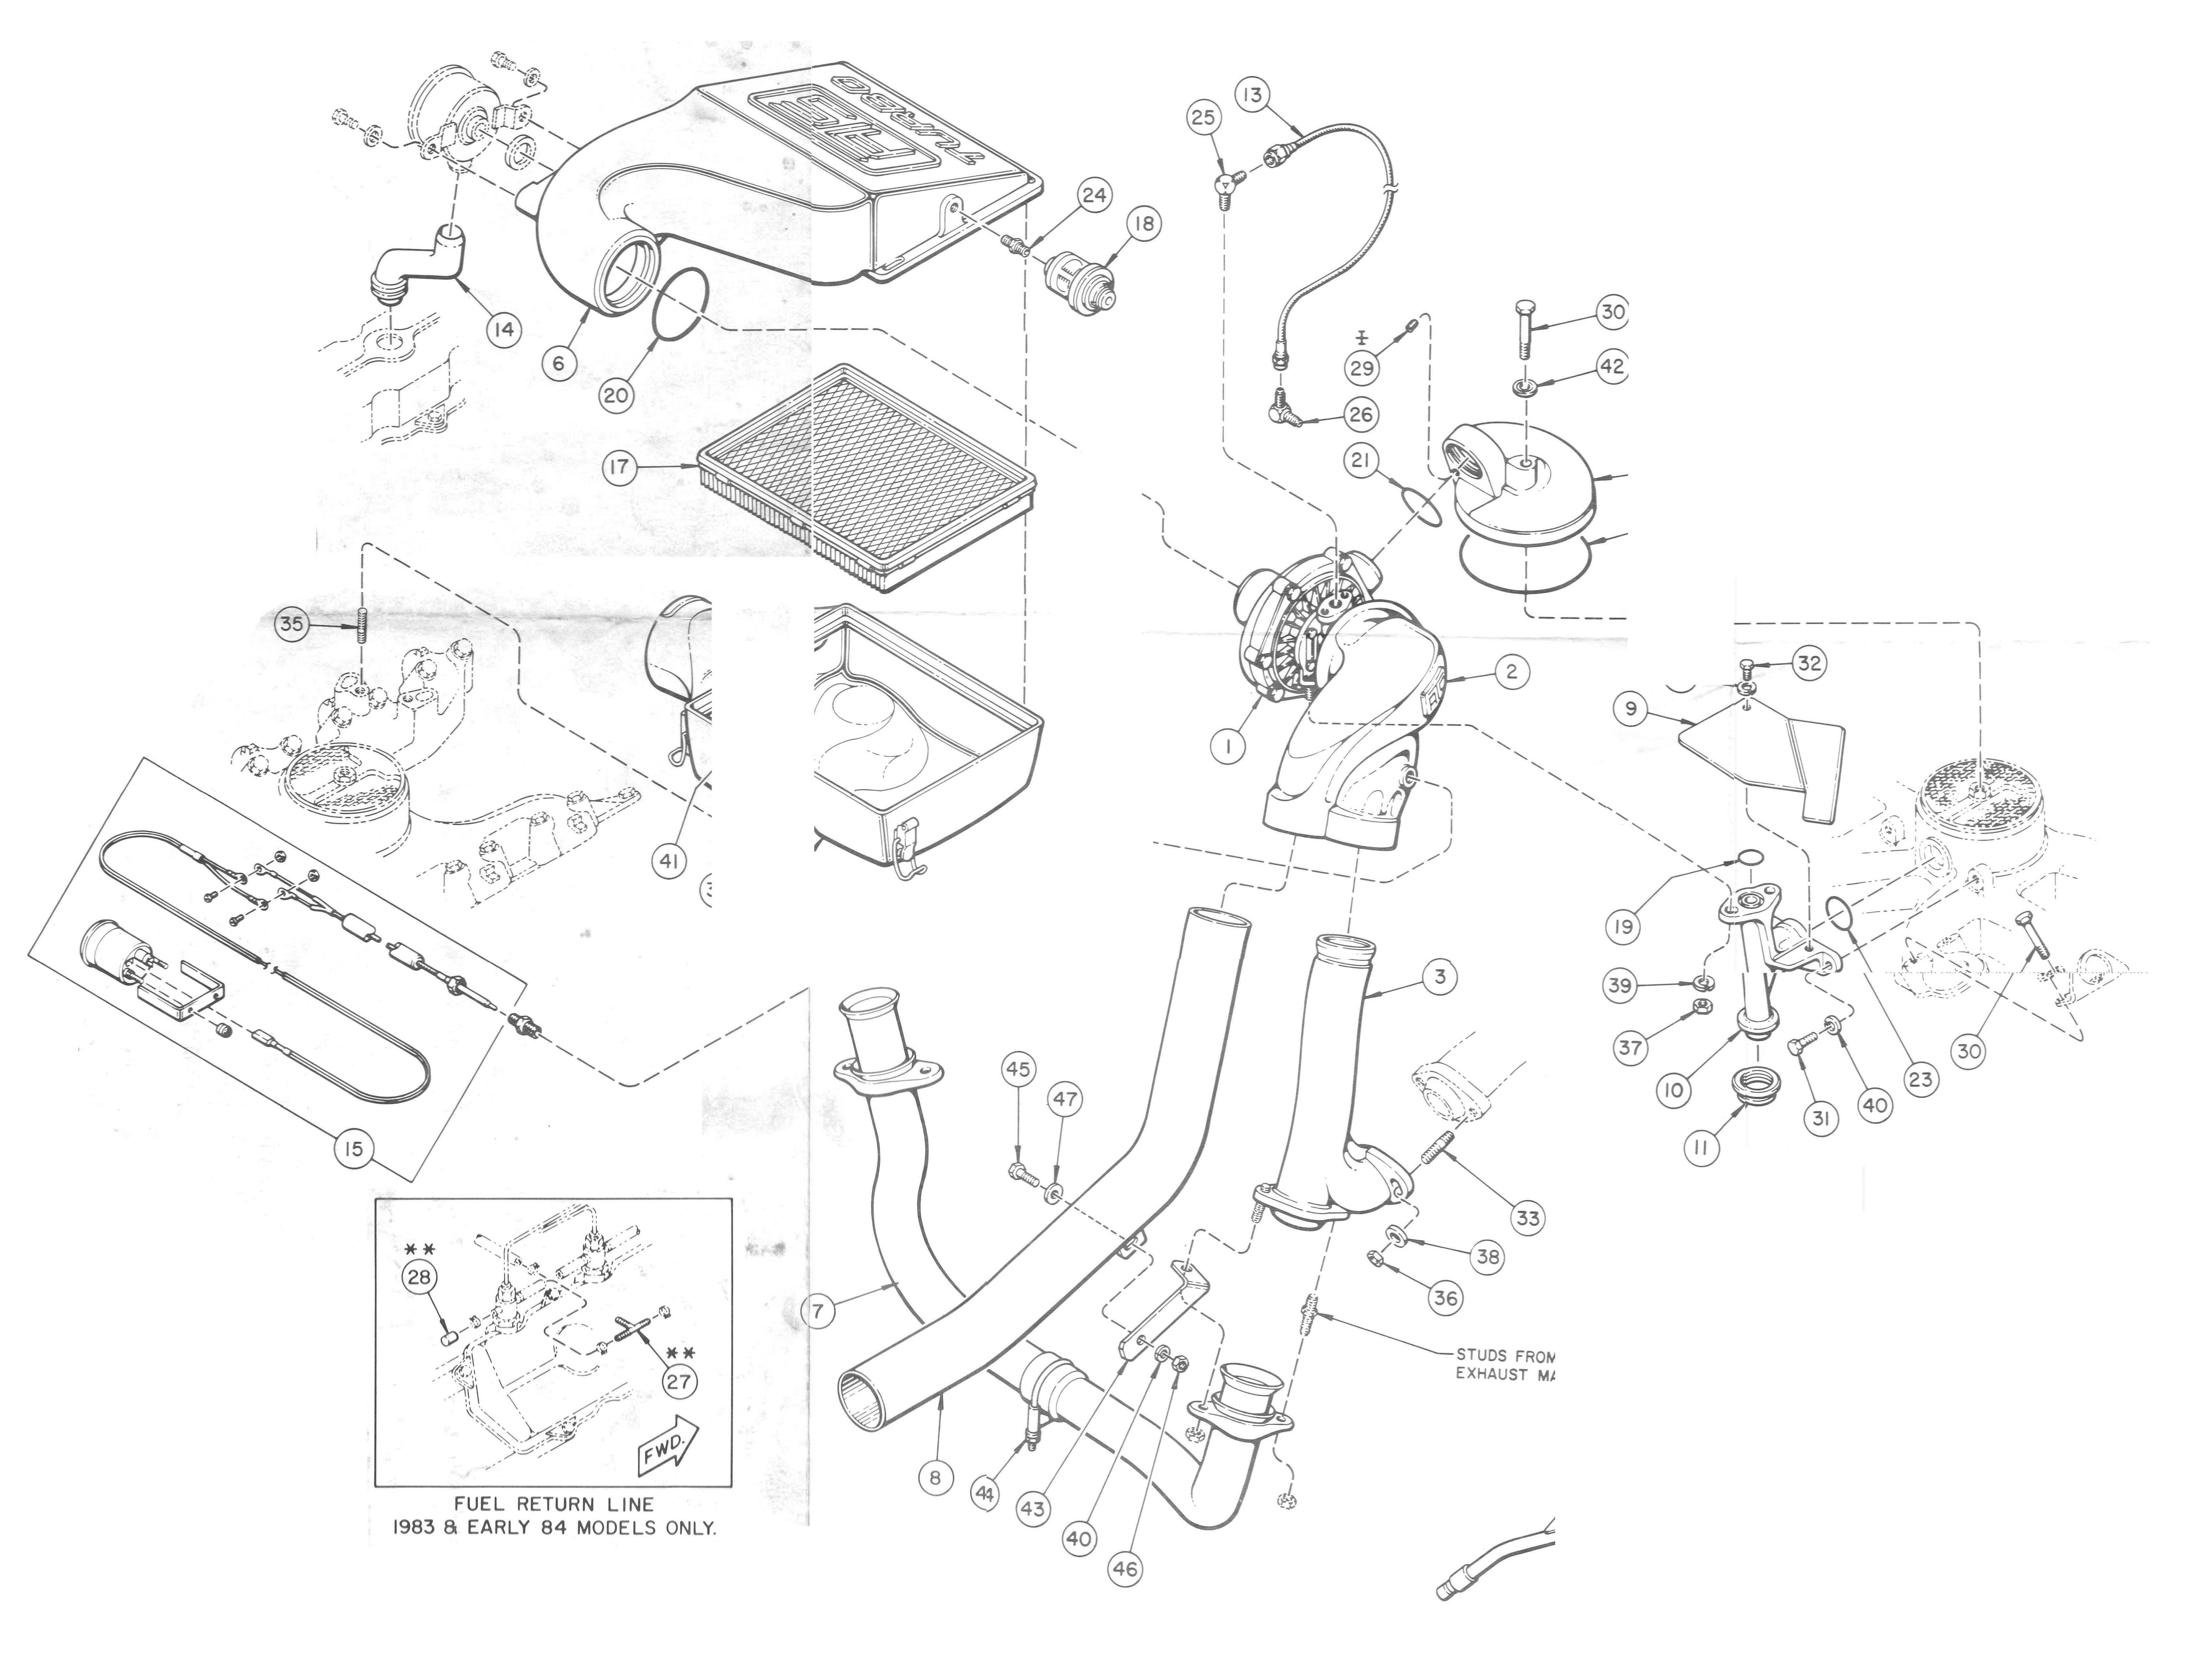 Nissan Vanette Wiring Diagram Pdf